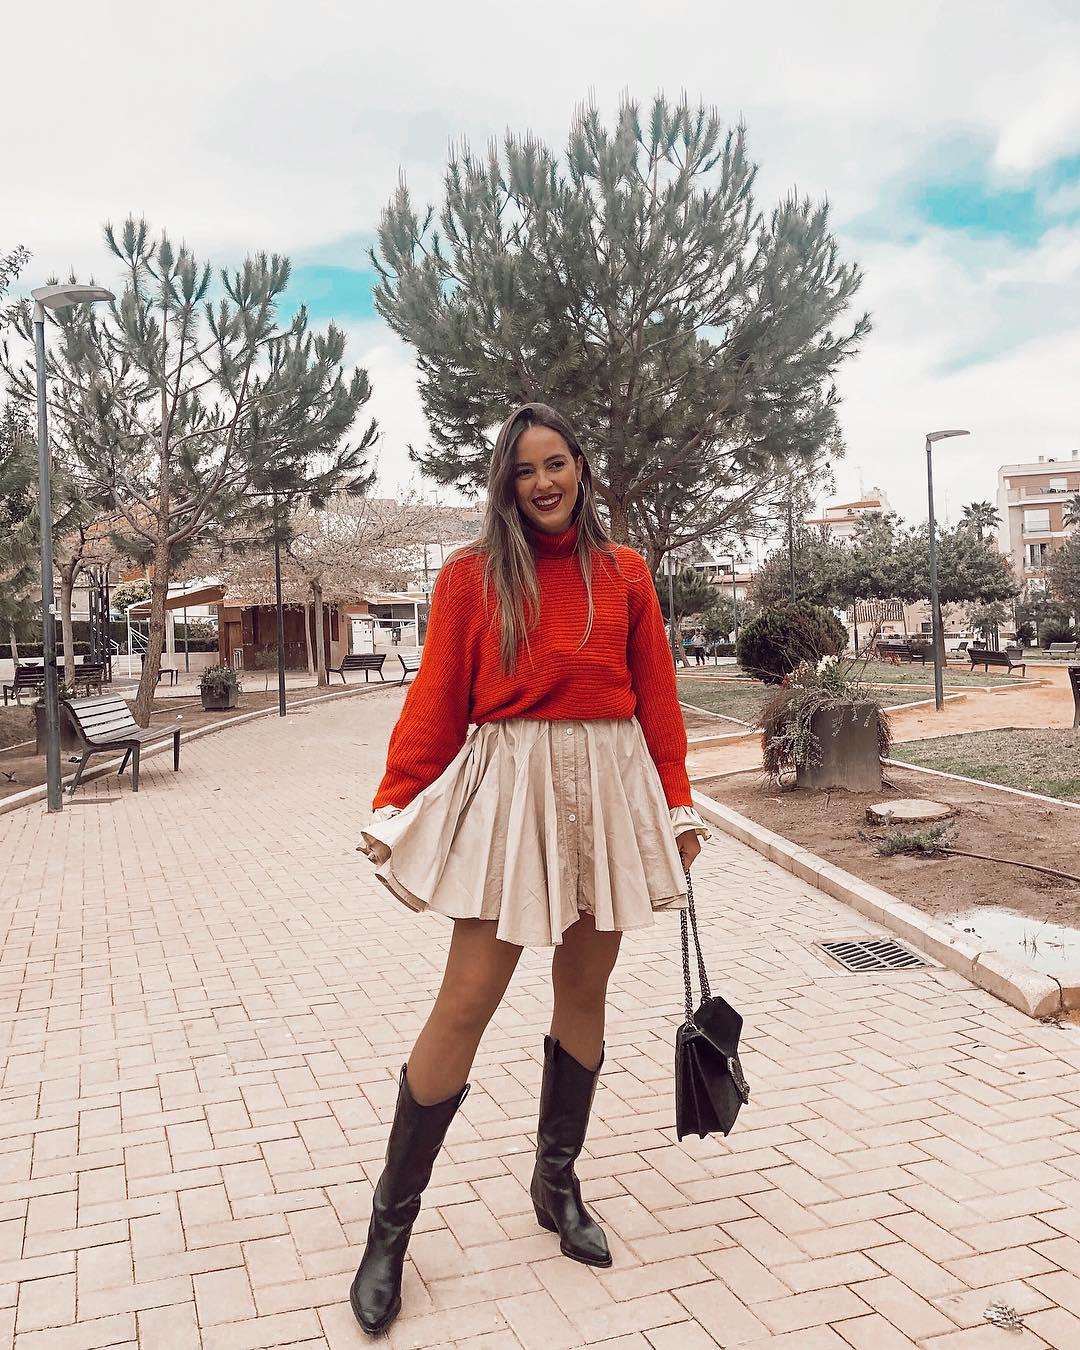 leather boots with cowboy heels de zara sur anasaez___